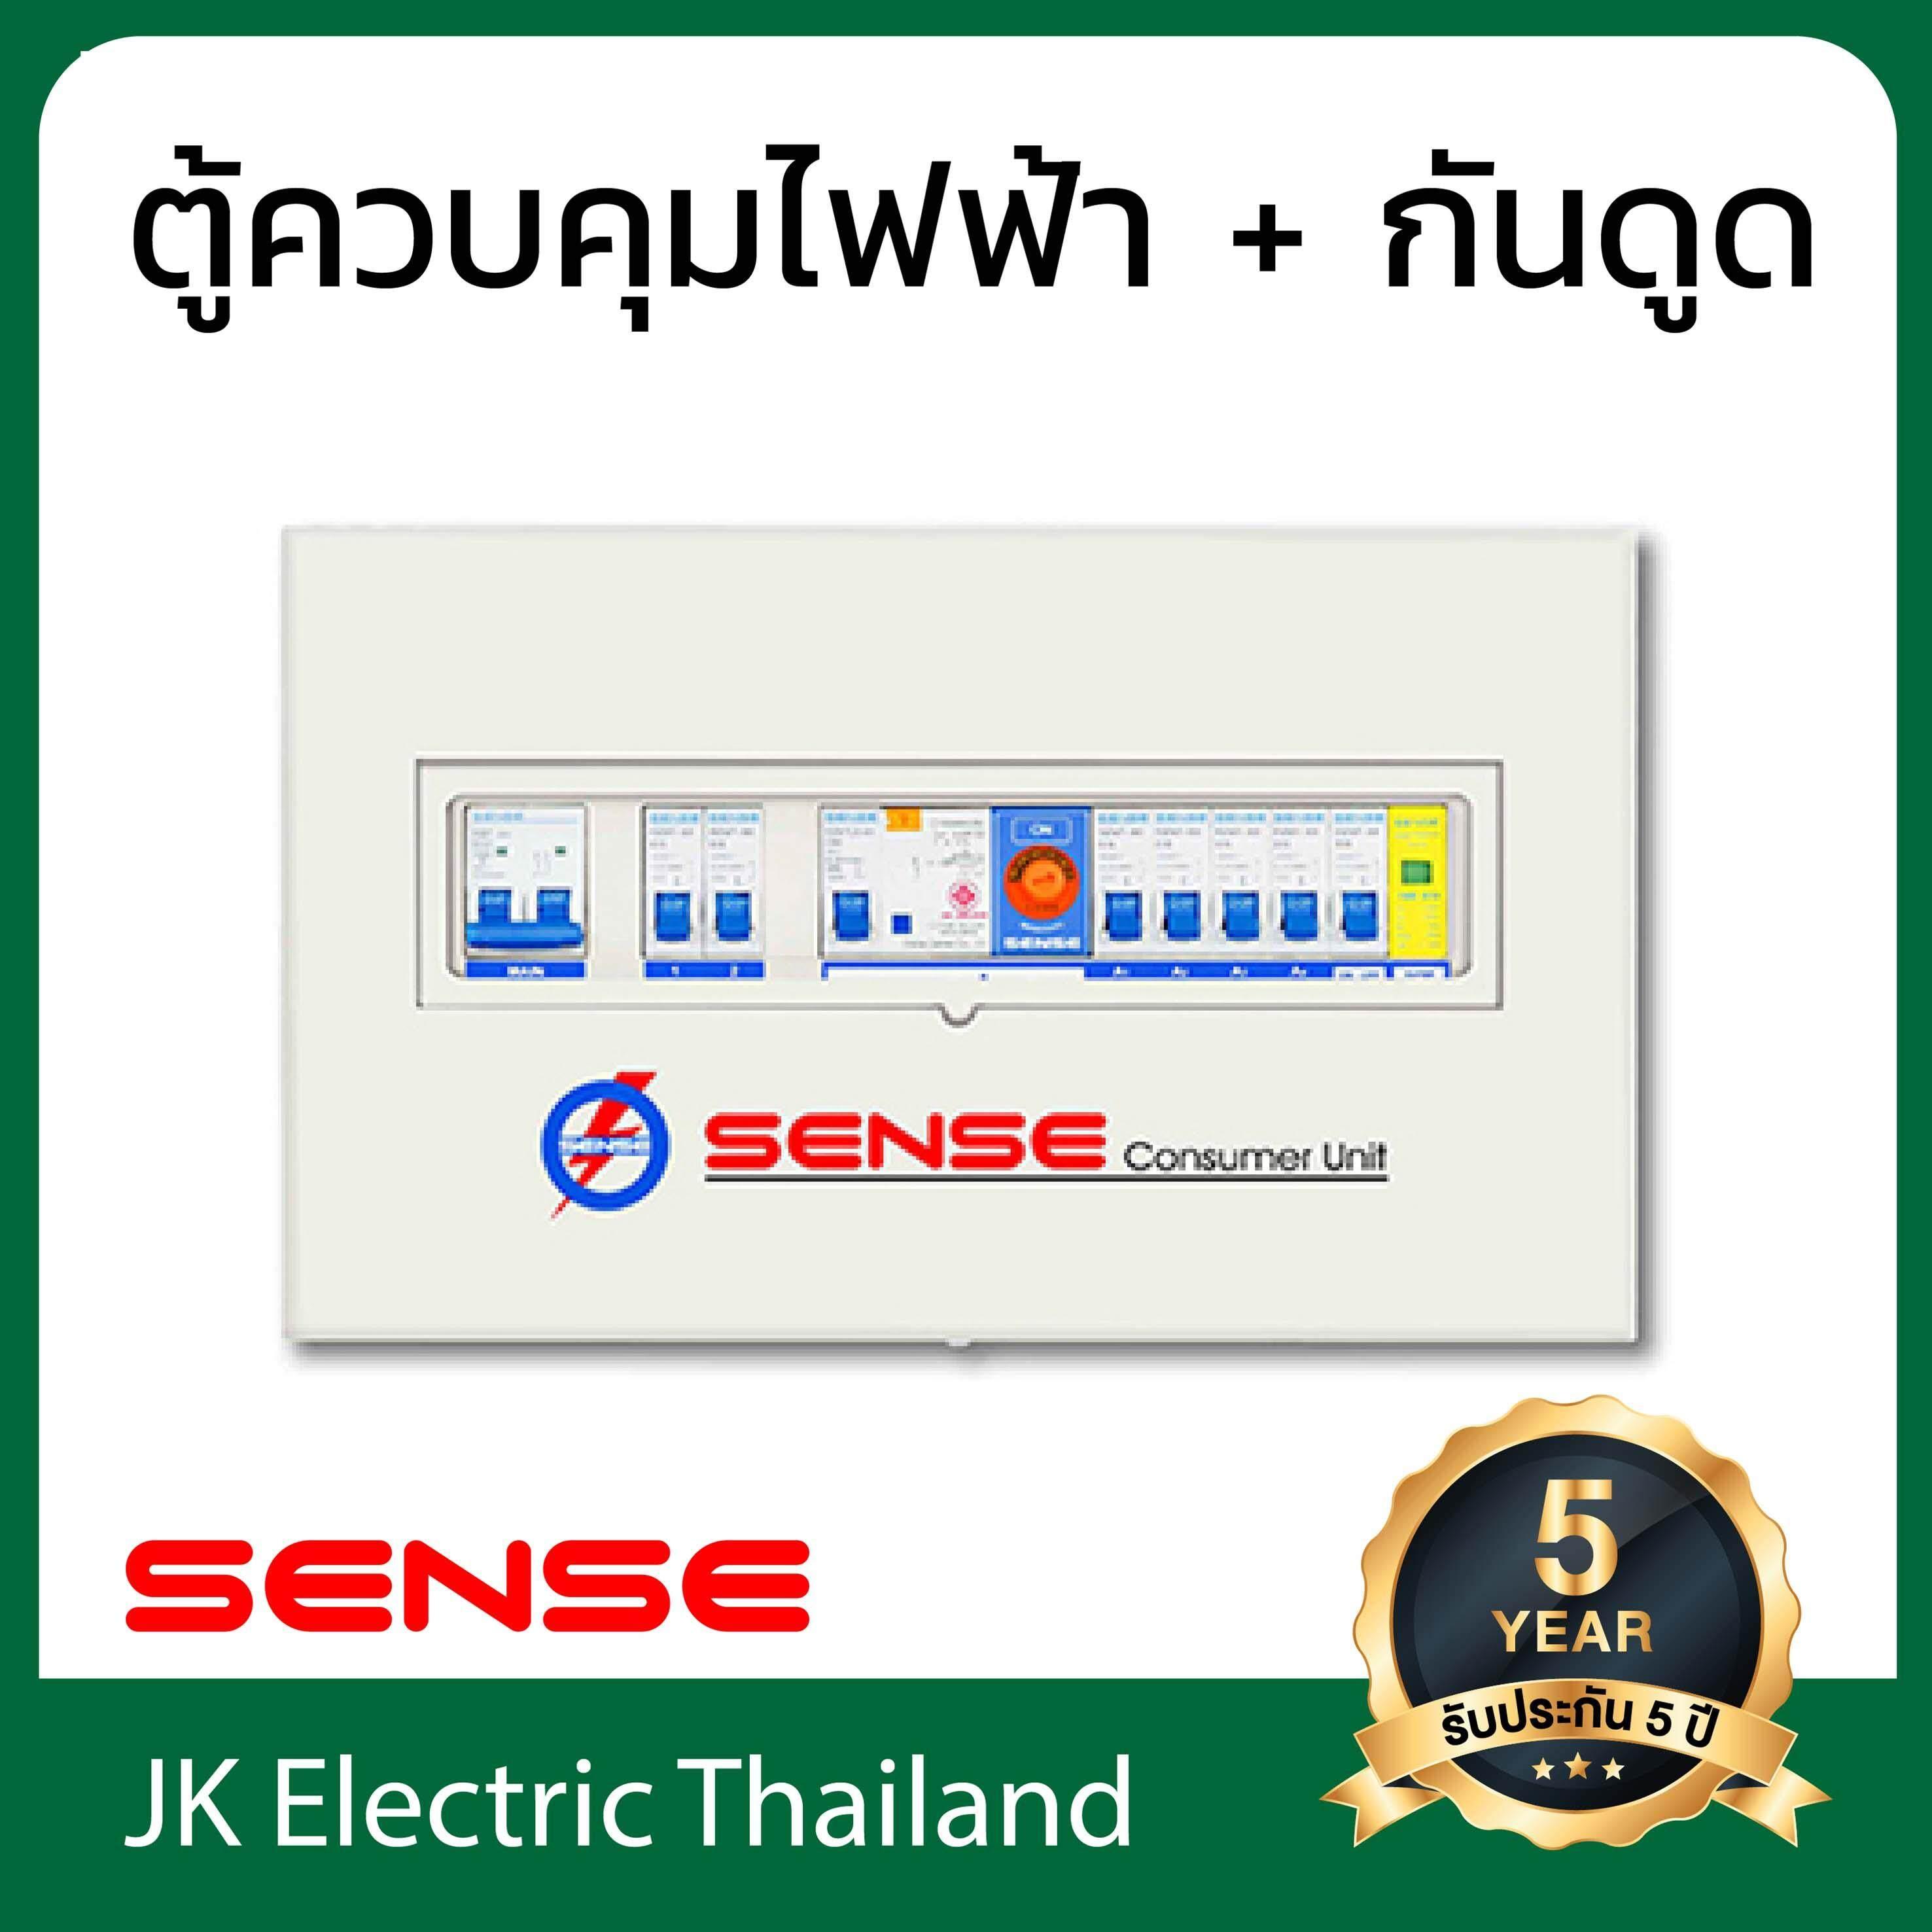 Sense ตู้ไฟ ตู้ควบคุมไฟฟ้า ตู้คอนซูมเมอร์ เซนส์ ชนิดแยกส่วน ขนาด 6 ช่อง พร้อม เครื่องตัดไฟรั่ว (rcd) และ อุปกรณ์ป้องกันฟ้าผ่า (spd) รุ่น U6n (เลือกขนาดเมน 32a, 50a, 63a และลูกย่อย 10a, 16a, 20a, 32a ตามต้องการ) ป้องกันไฟดูด ไฟช็อต ไฟรั่ว ใช้ไฟเกิน.